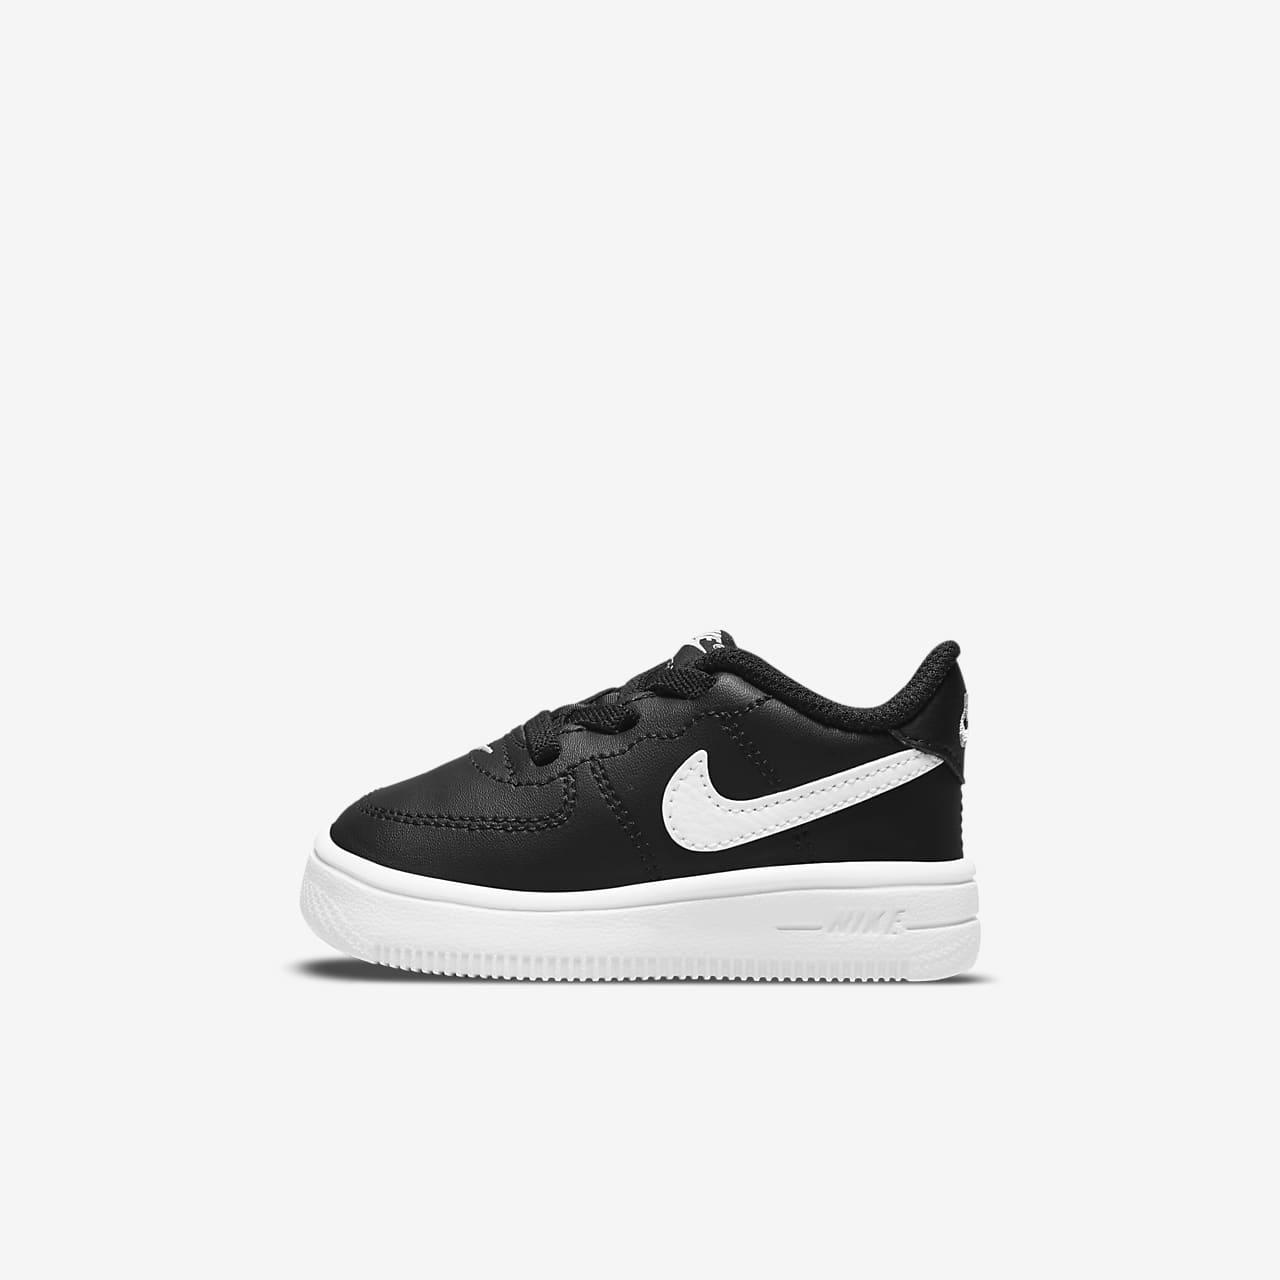 Nike Air Force 1 All Star 06 Xp